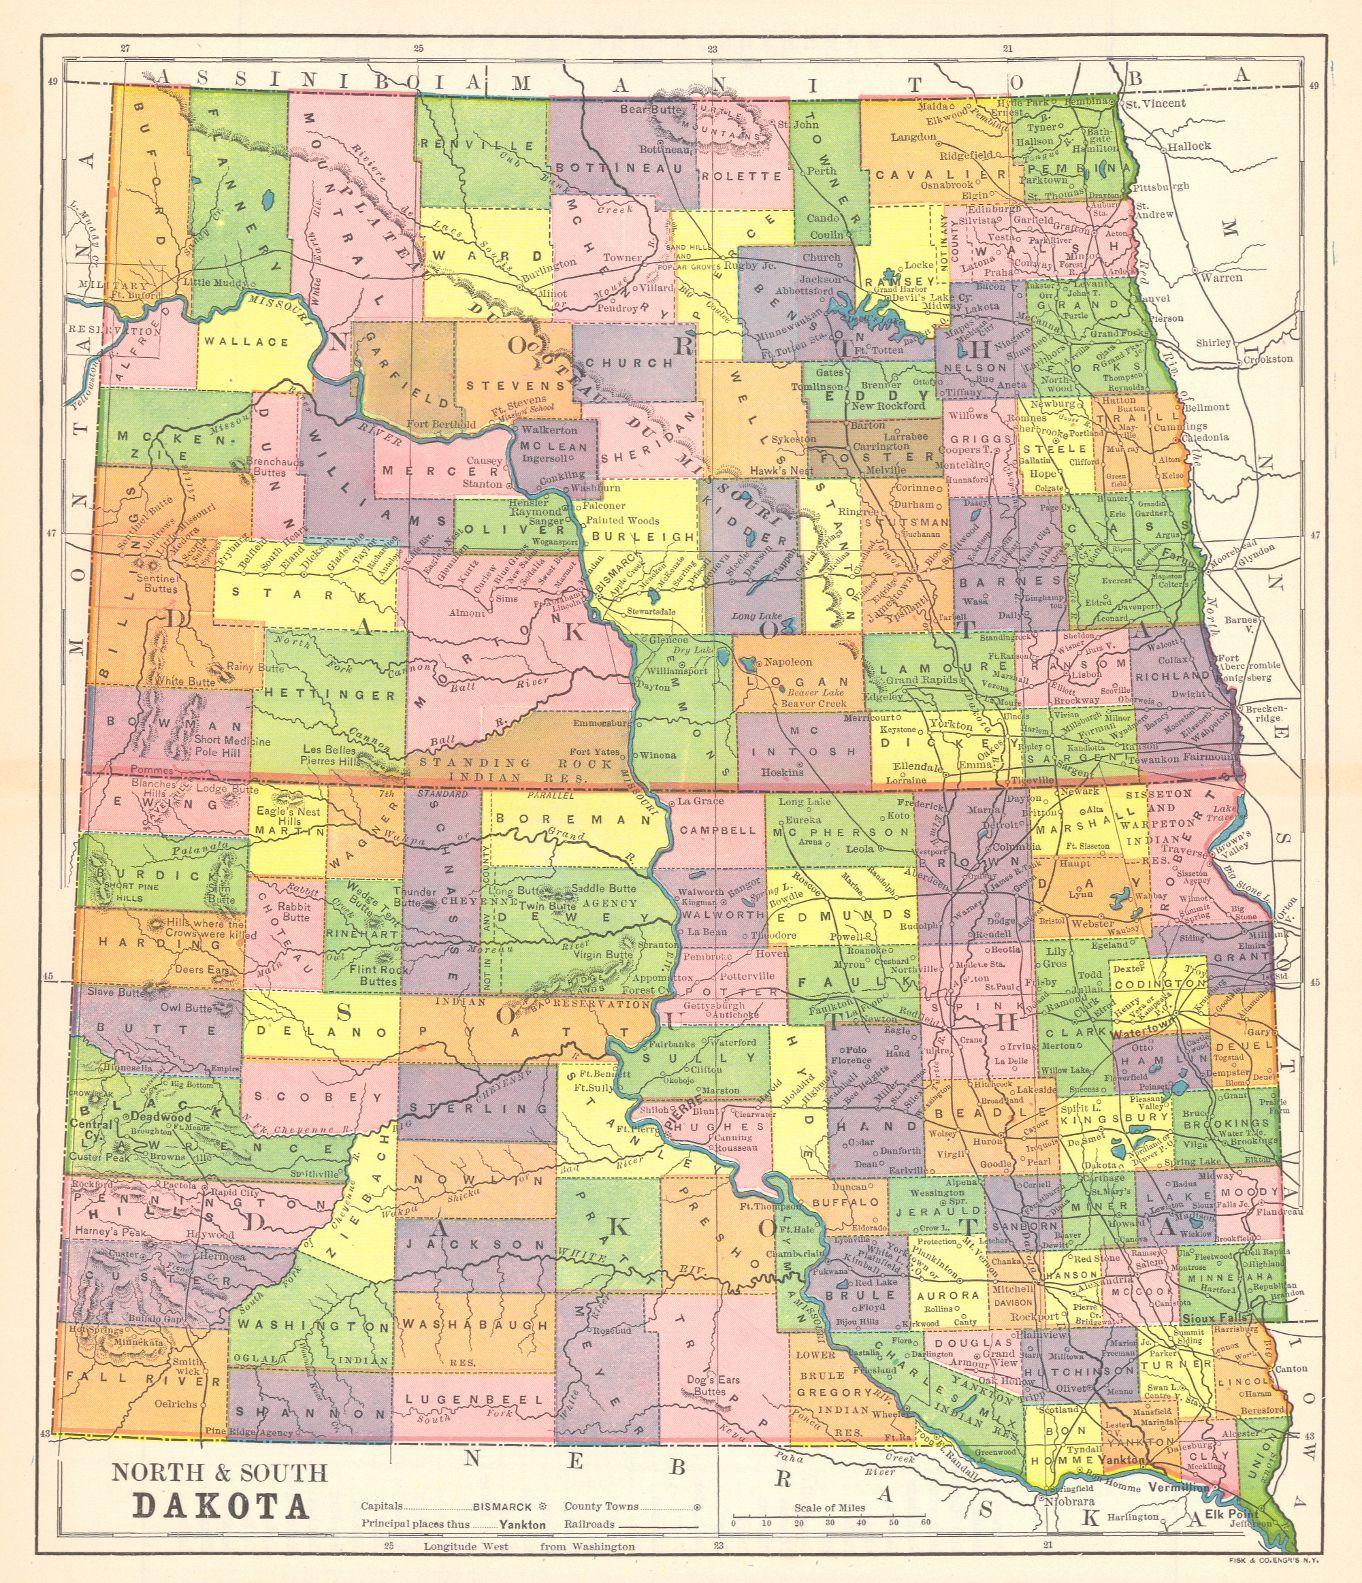 north and south dakota map Map Antique North South Dakota South Dakota North South North north and south dakota map